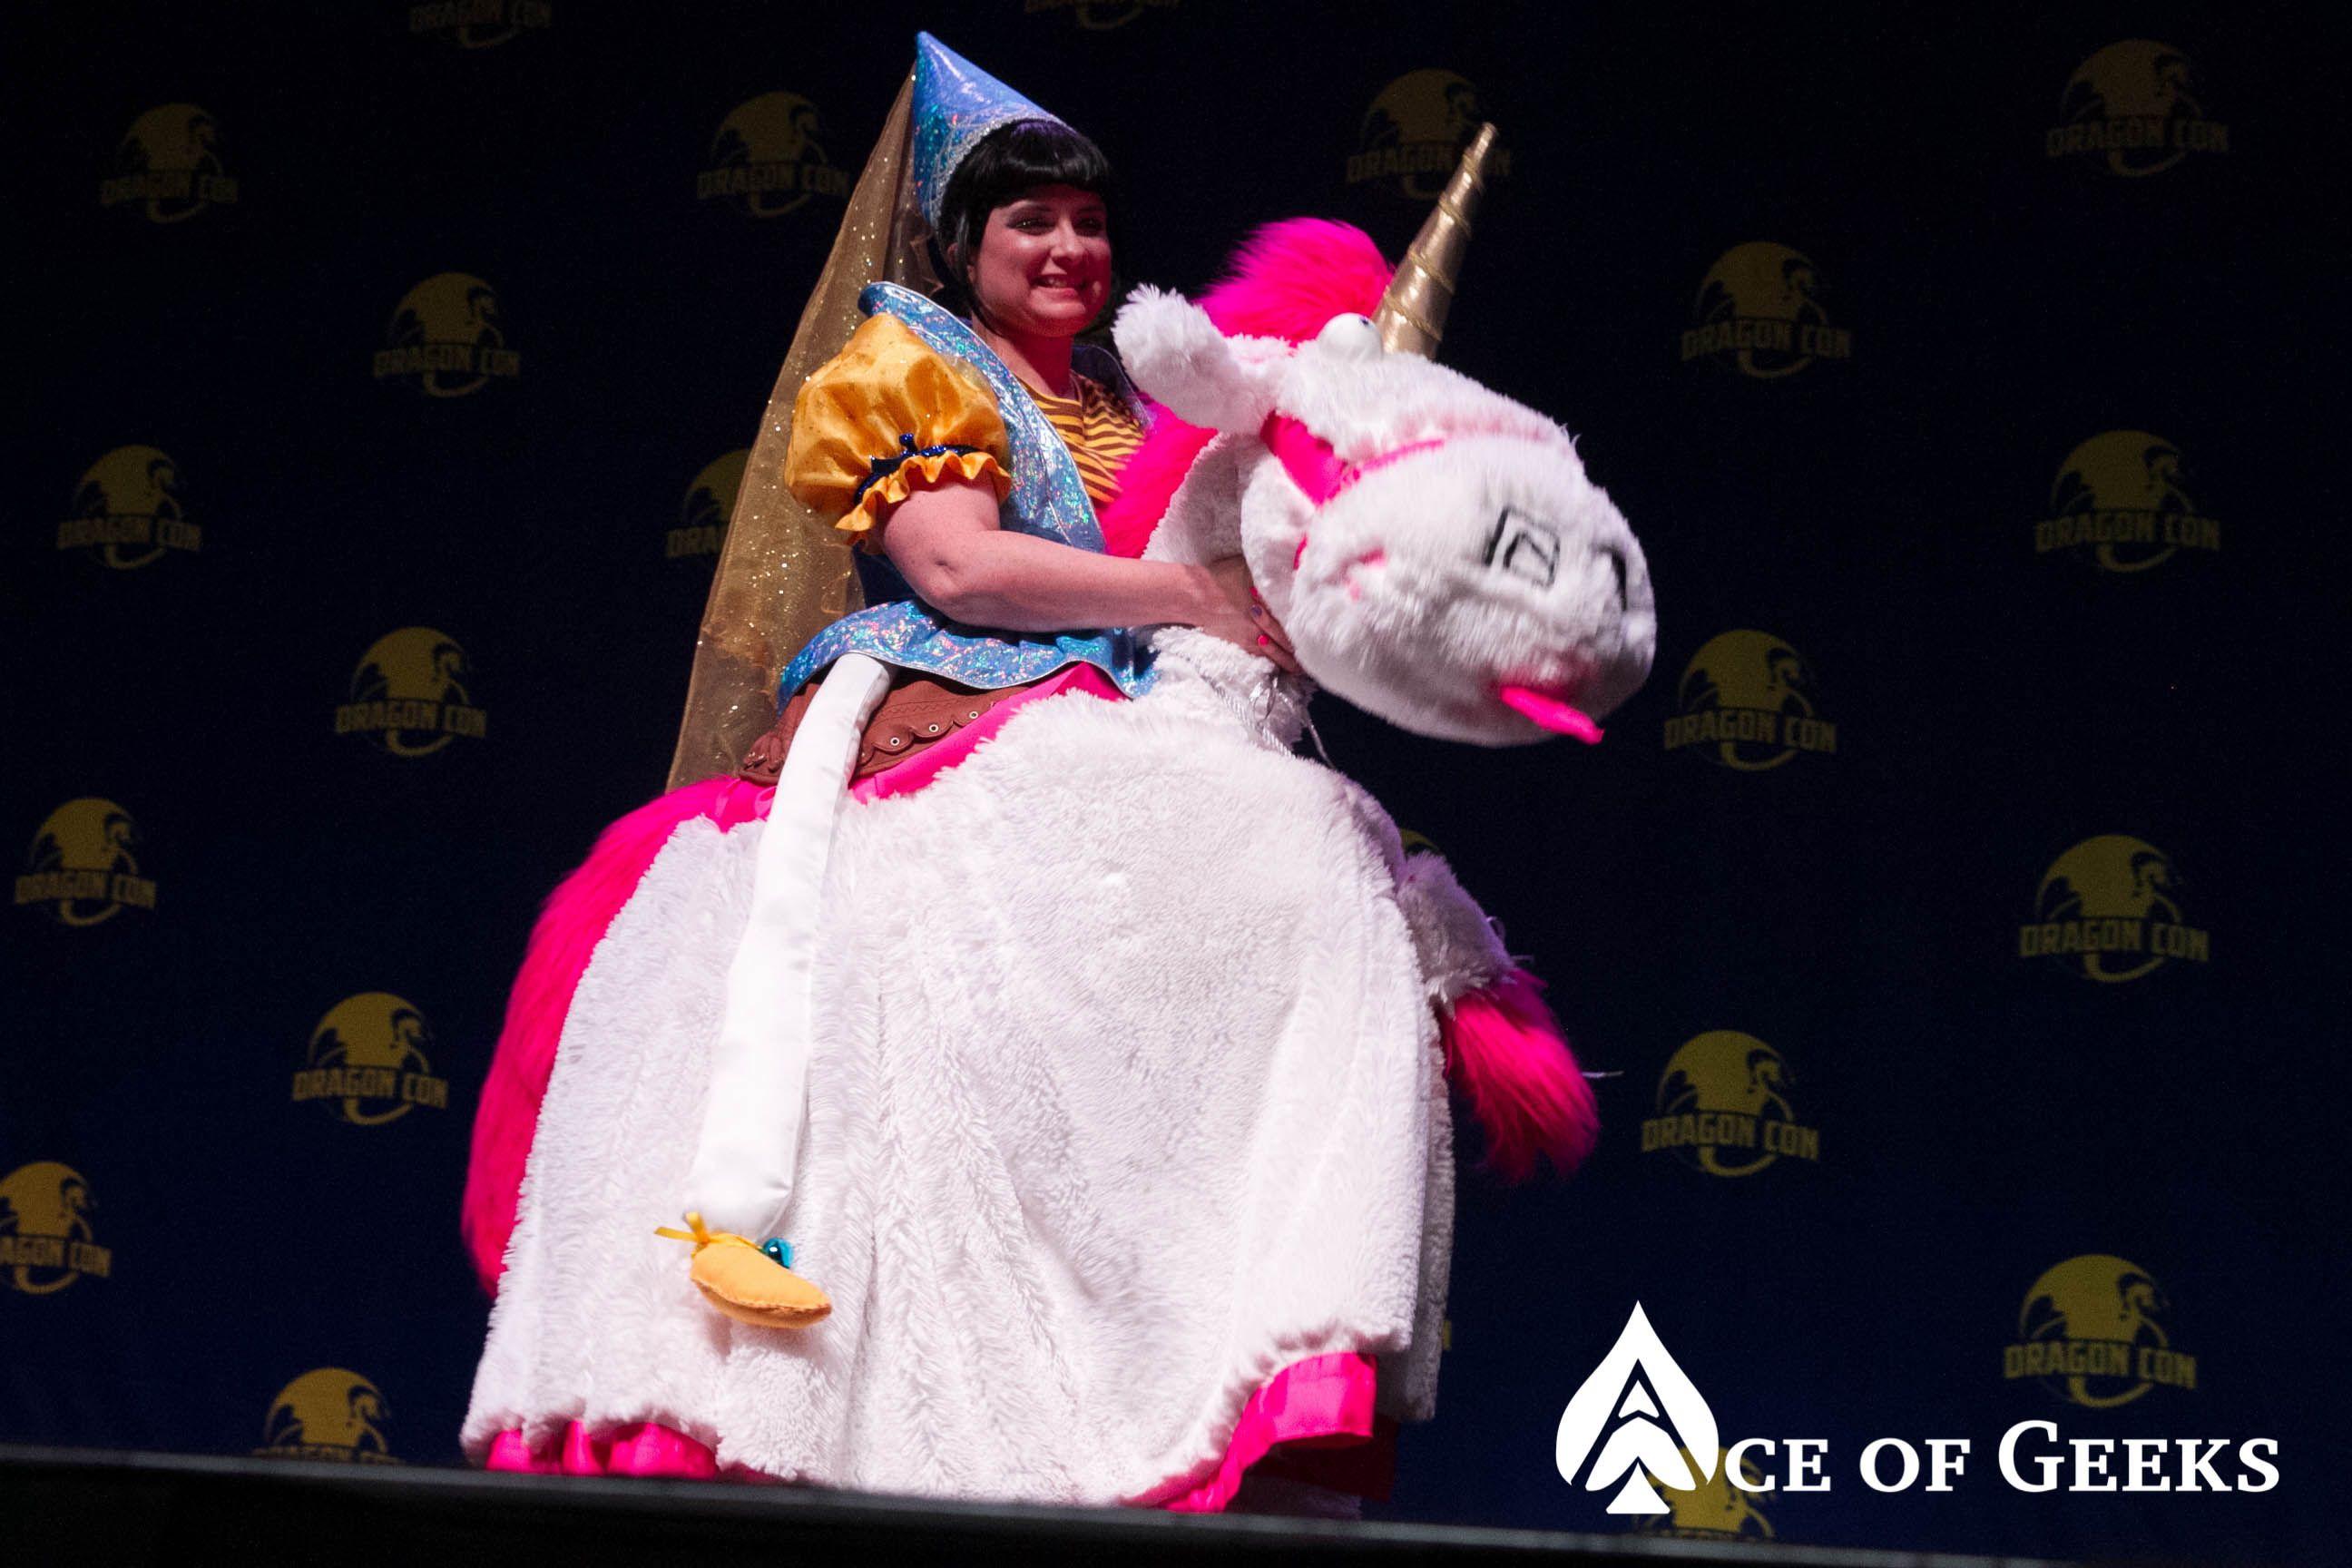 Related image Unicorn costume, Cosplay costumes, Costumes